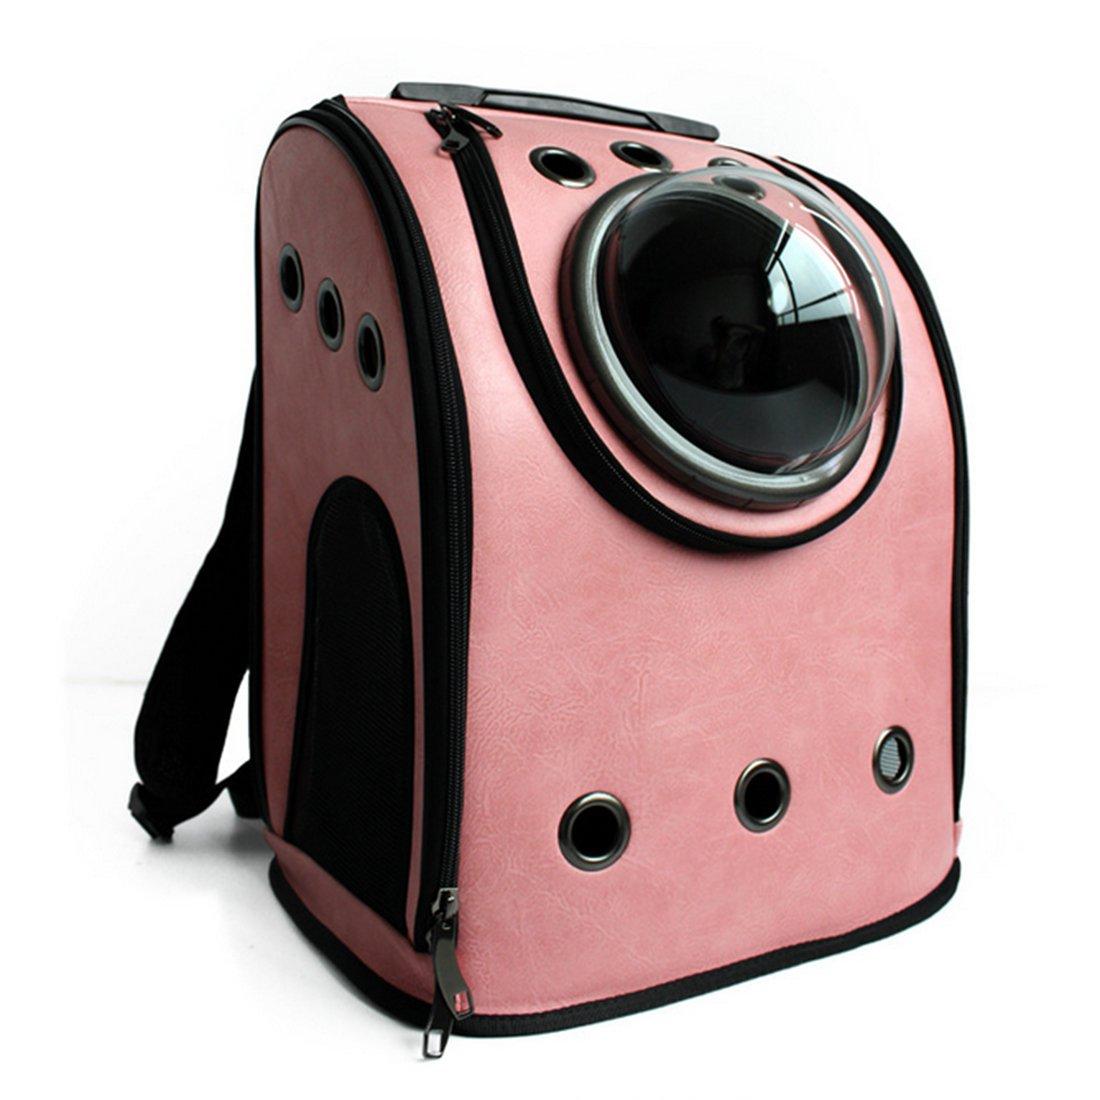 Petforu Pet Carrier Backpack, Space Capsule Dog Cat Small Animals Travel Bag - Pink